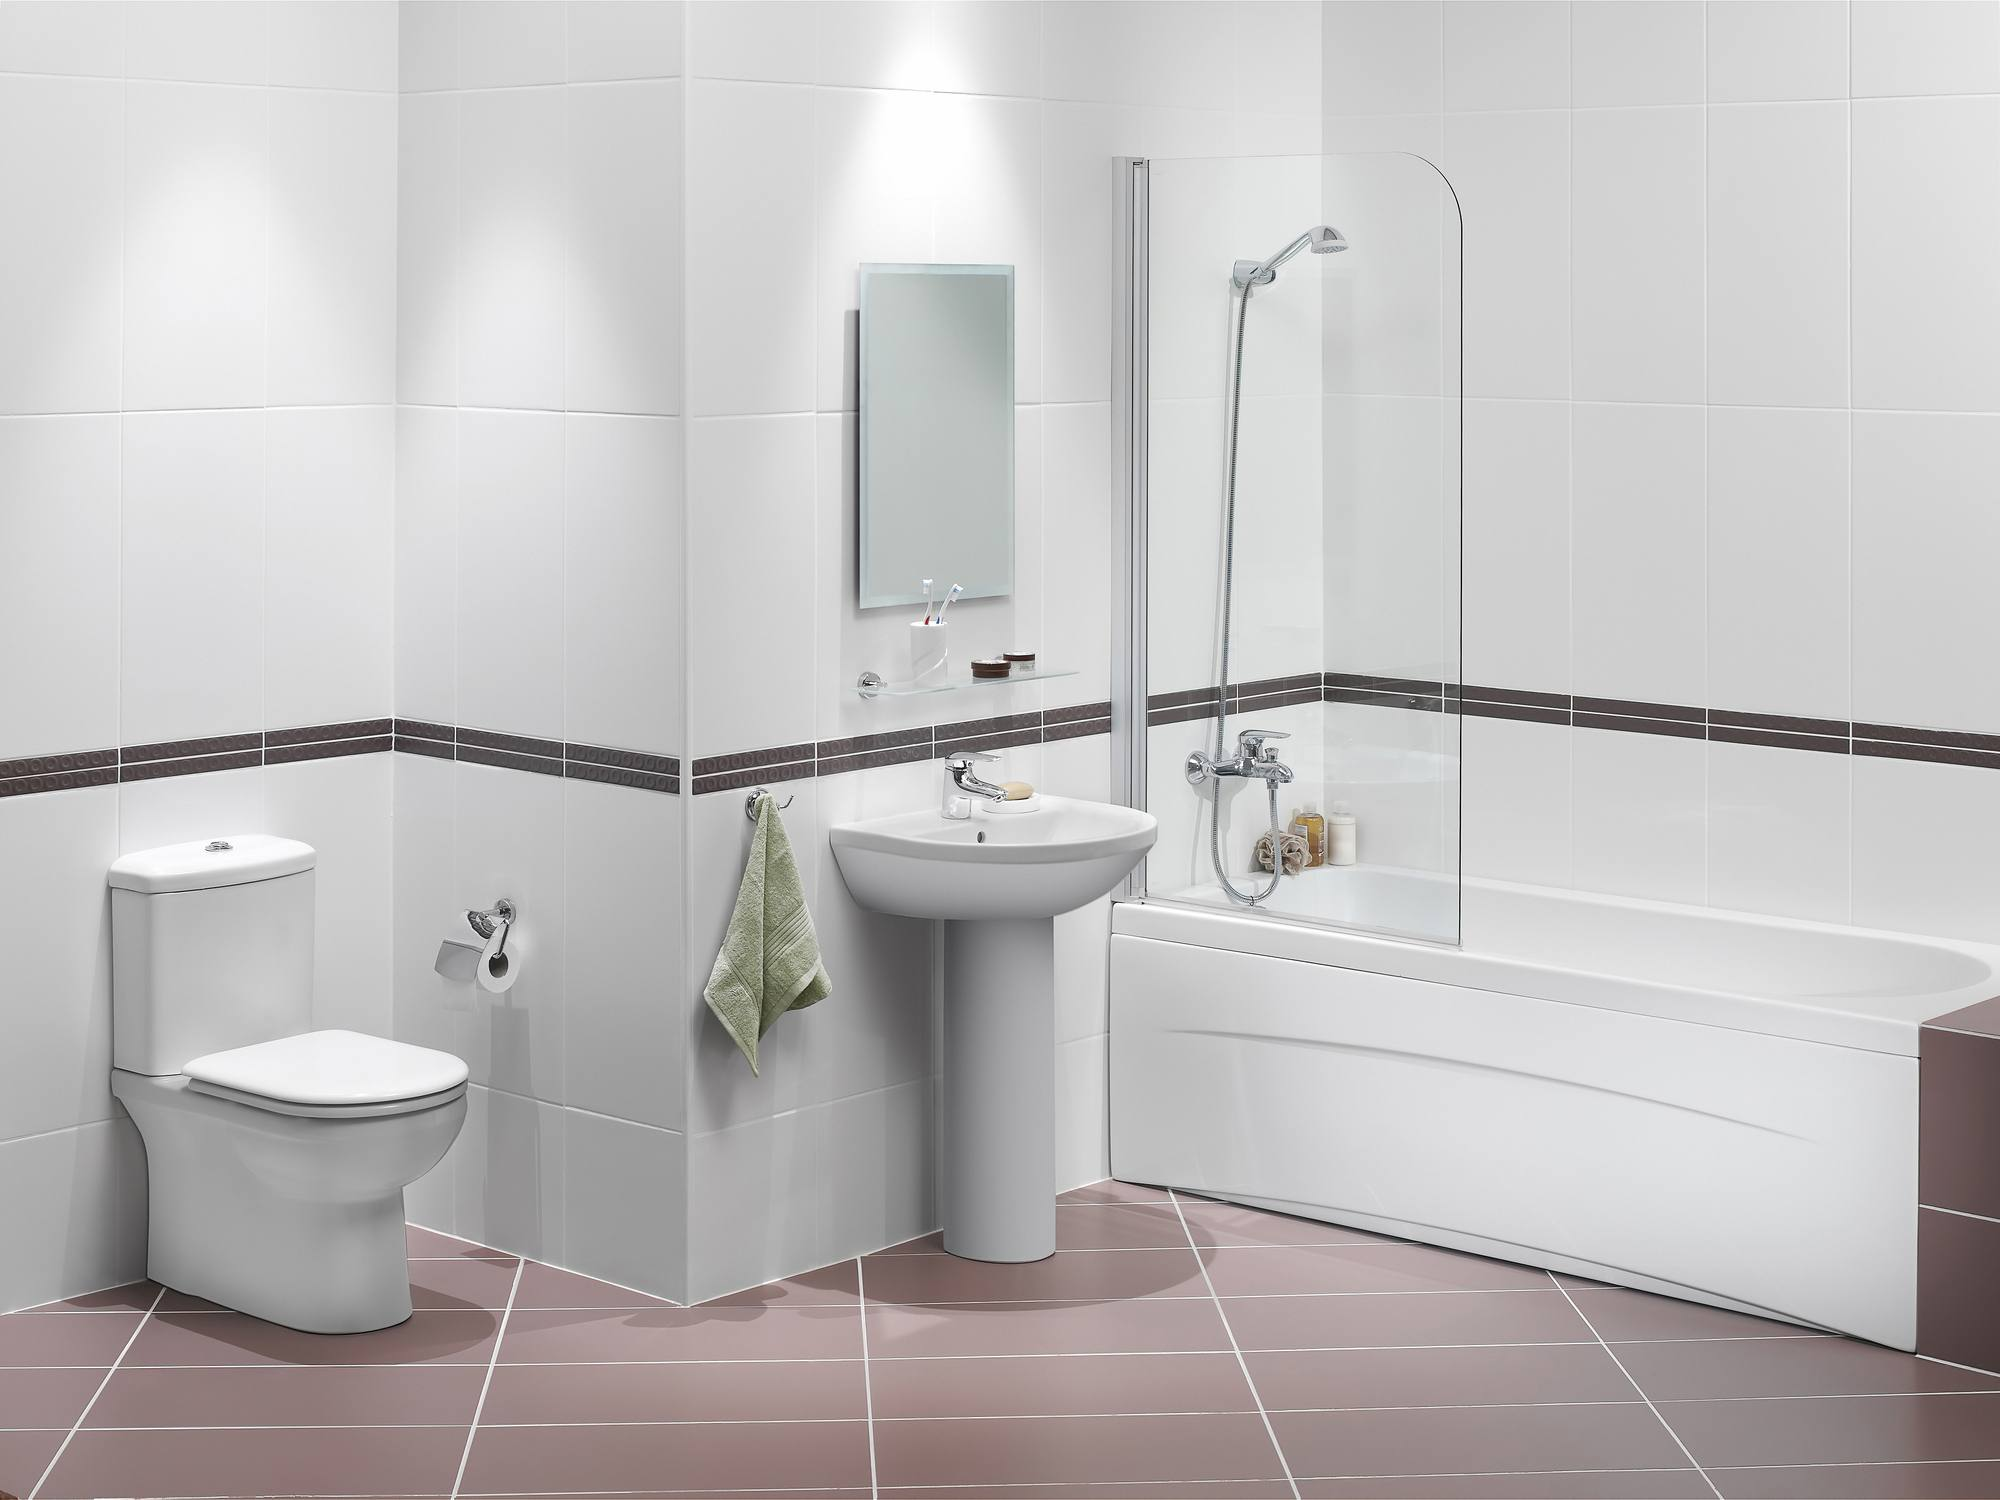 Diagonal Floor Tile - Ideas and Inspiration